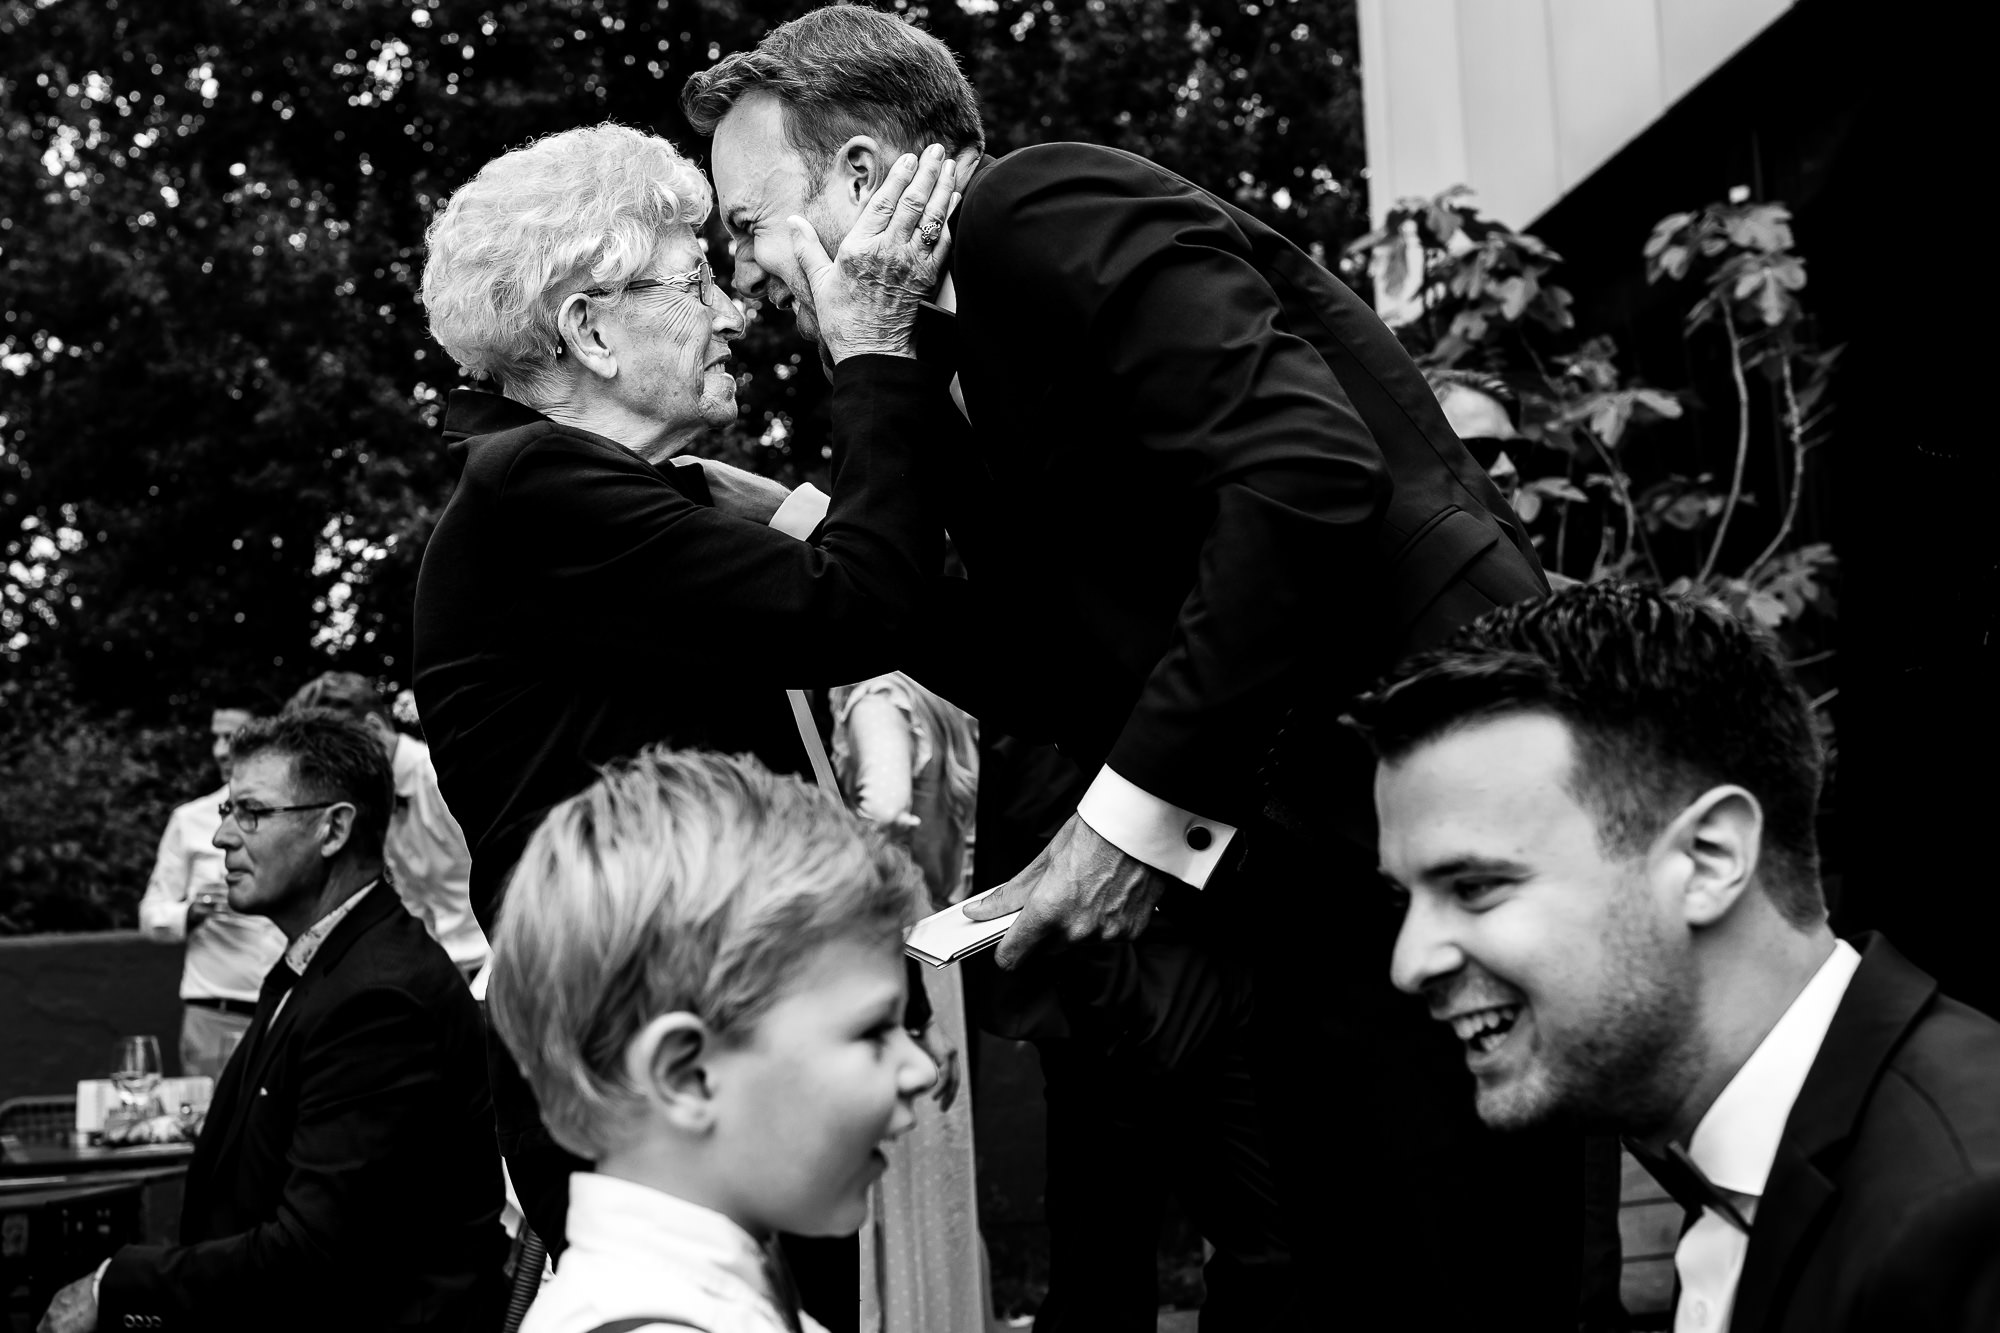 Bruidegom knuffelt zijn oma